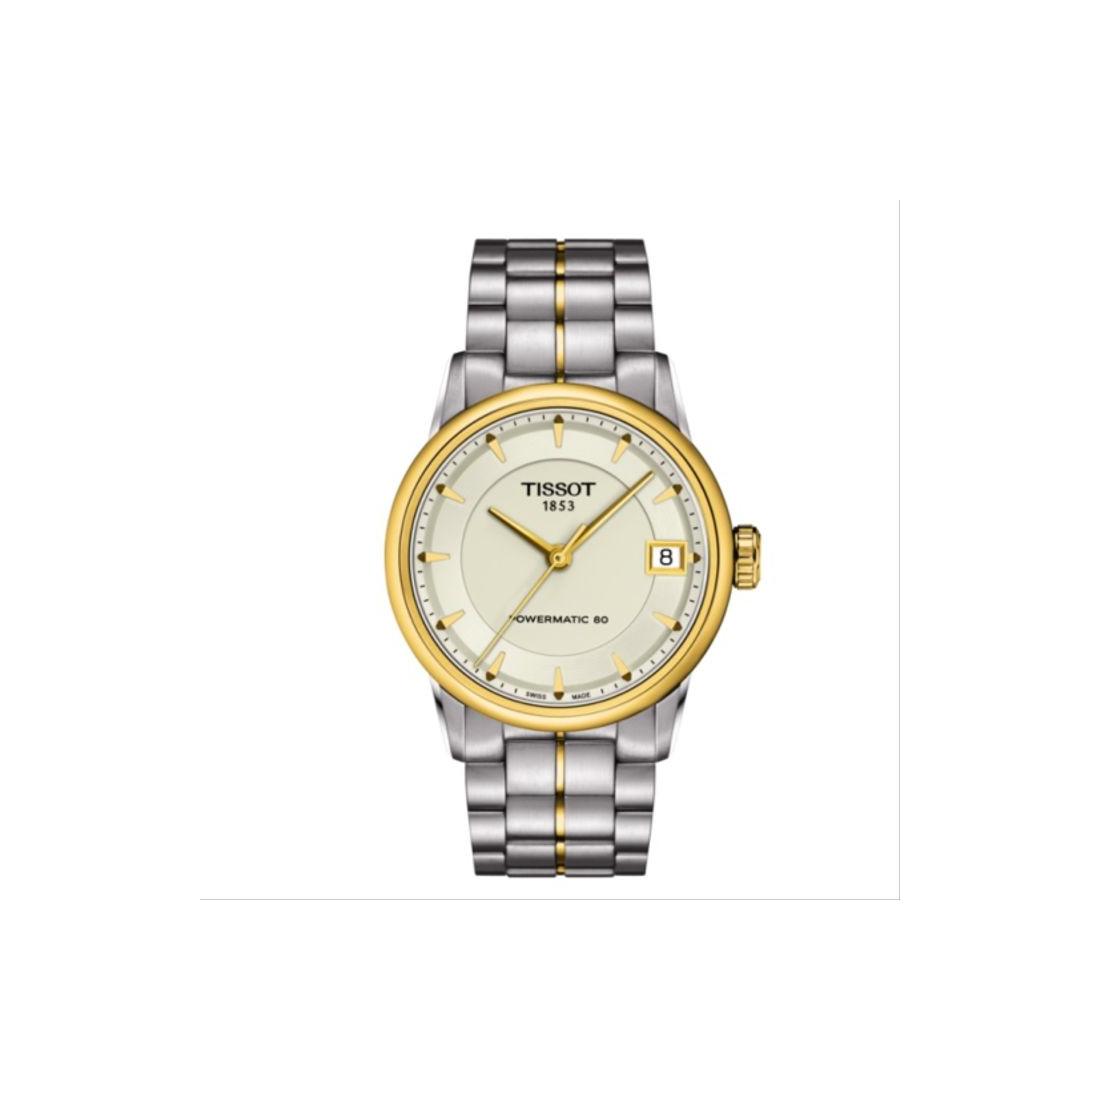 c6ec1fe53fa Jam tangan original citizen ab citizen automatic jpg 800x800 Citizen np4000